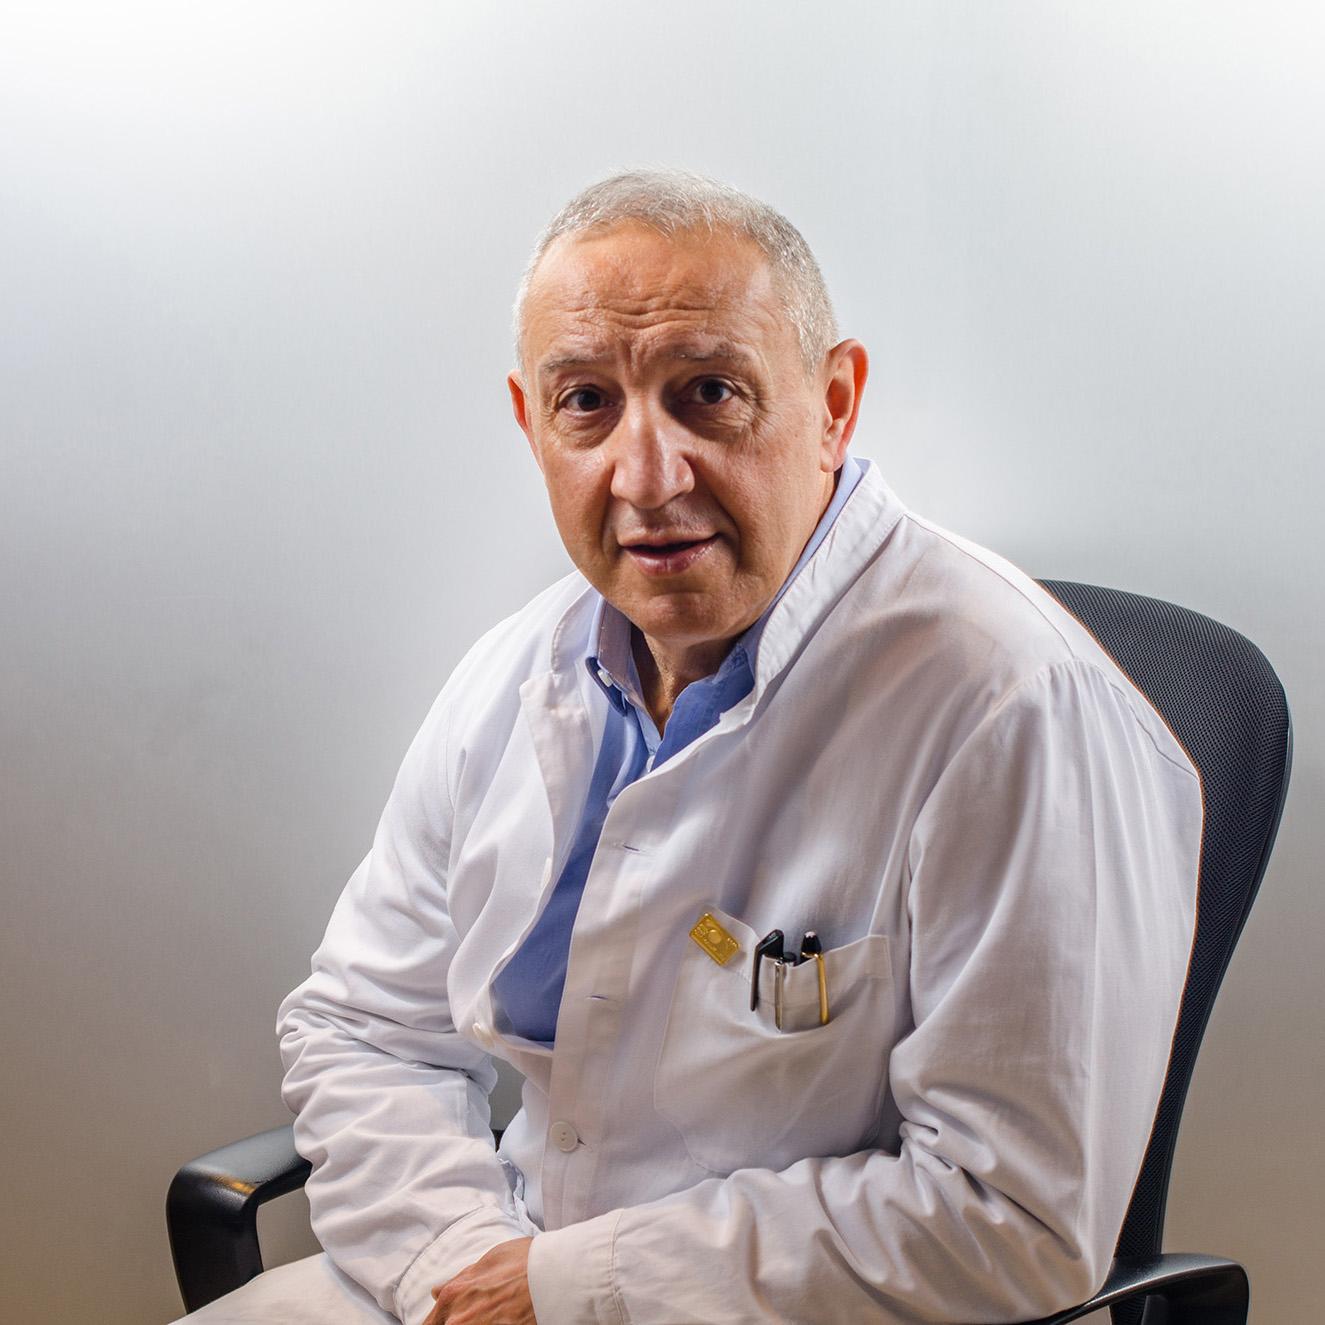 Massimo Trevisol